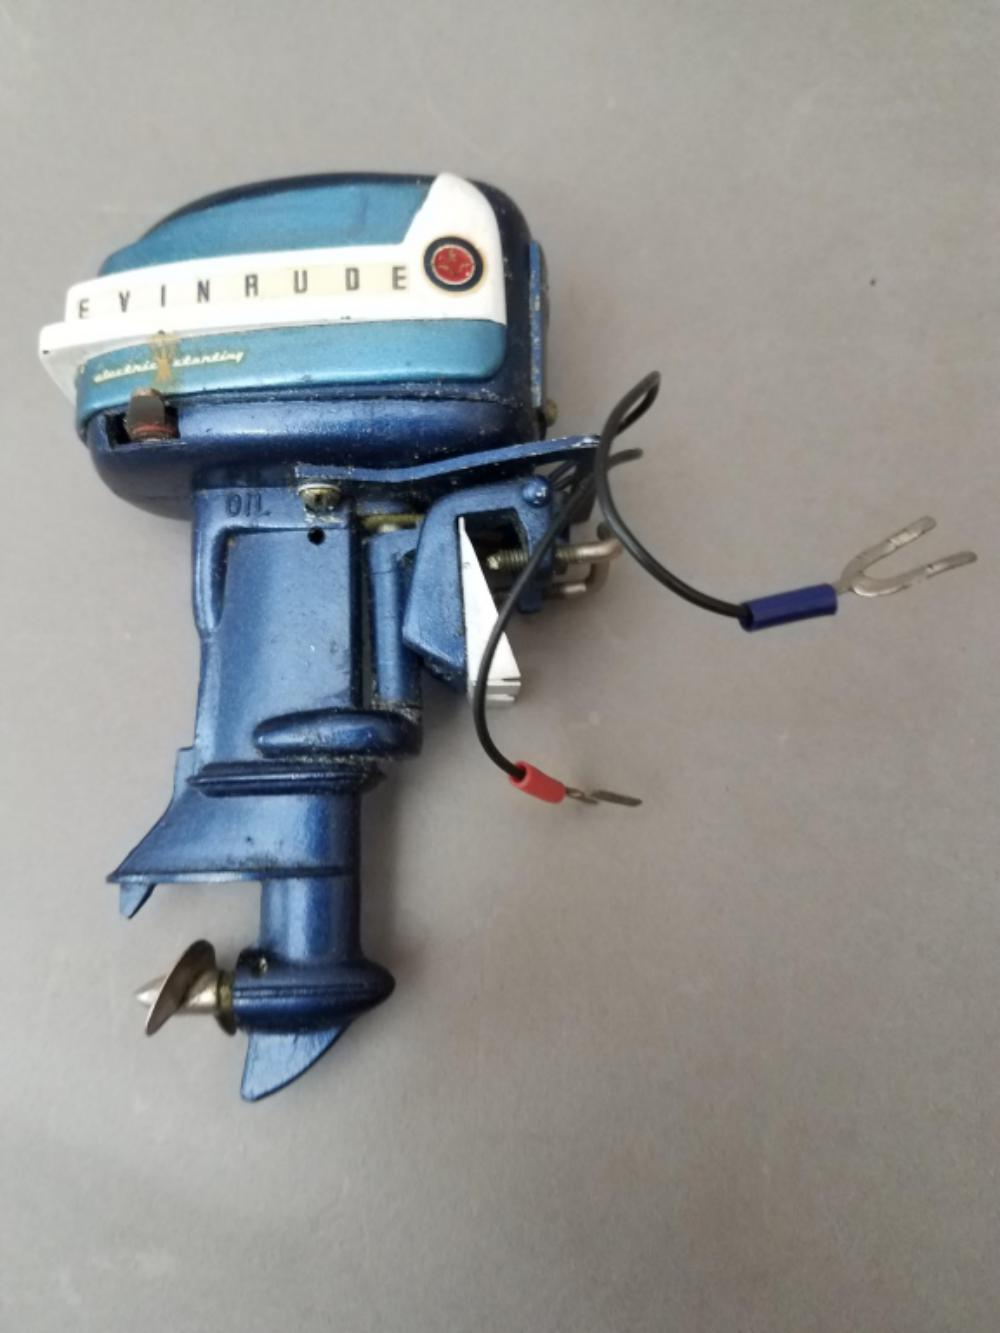 Vintage Evinrude Big Twin Toy Outboard Motor